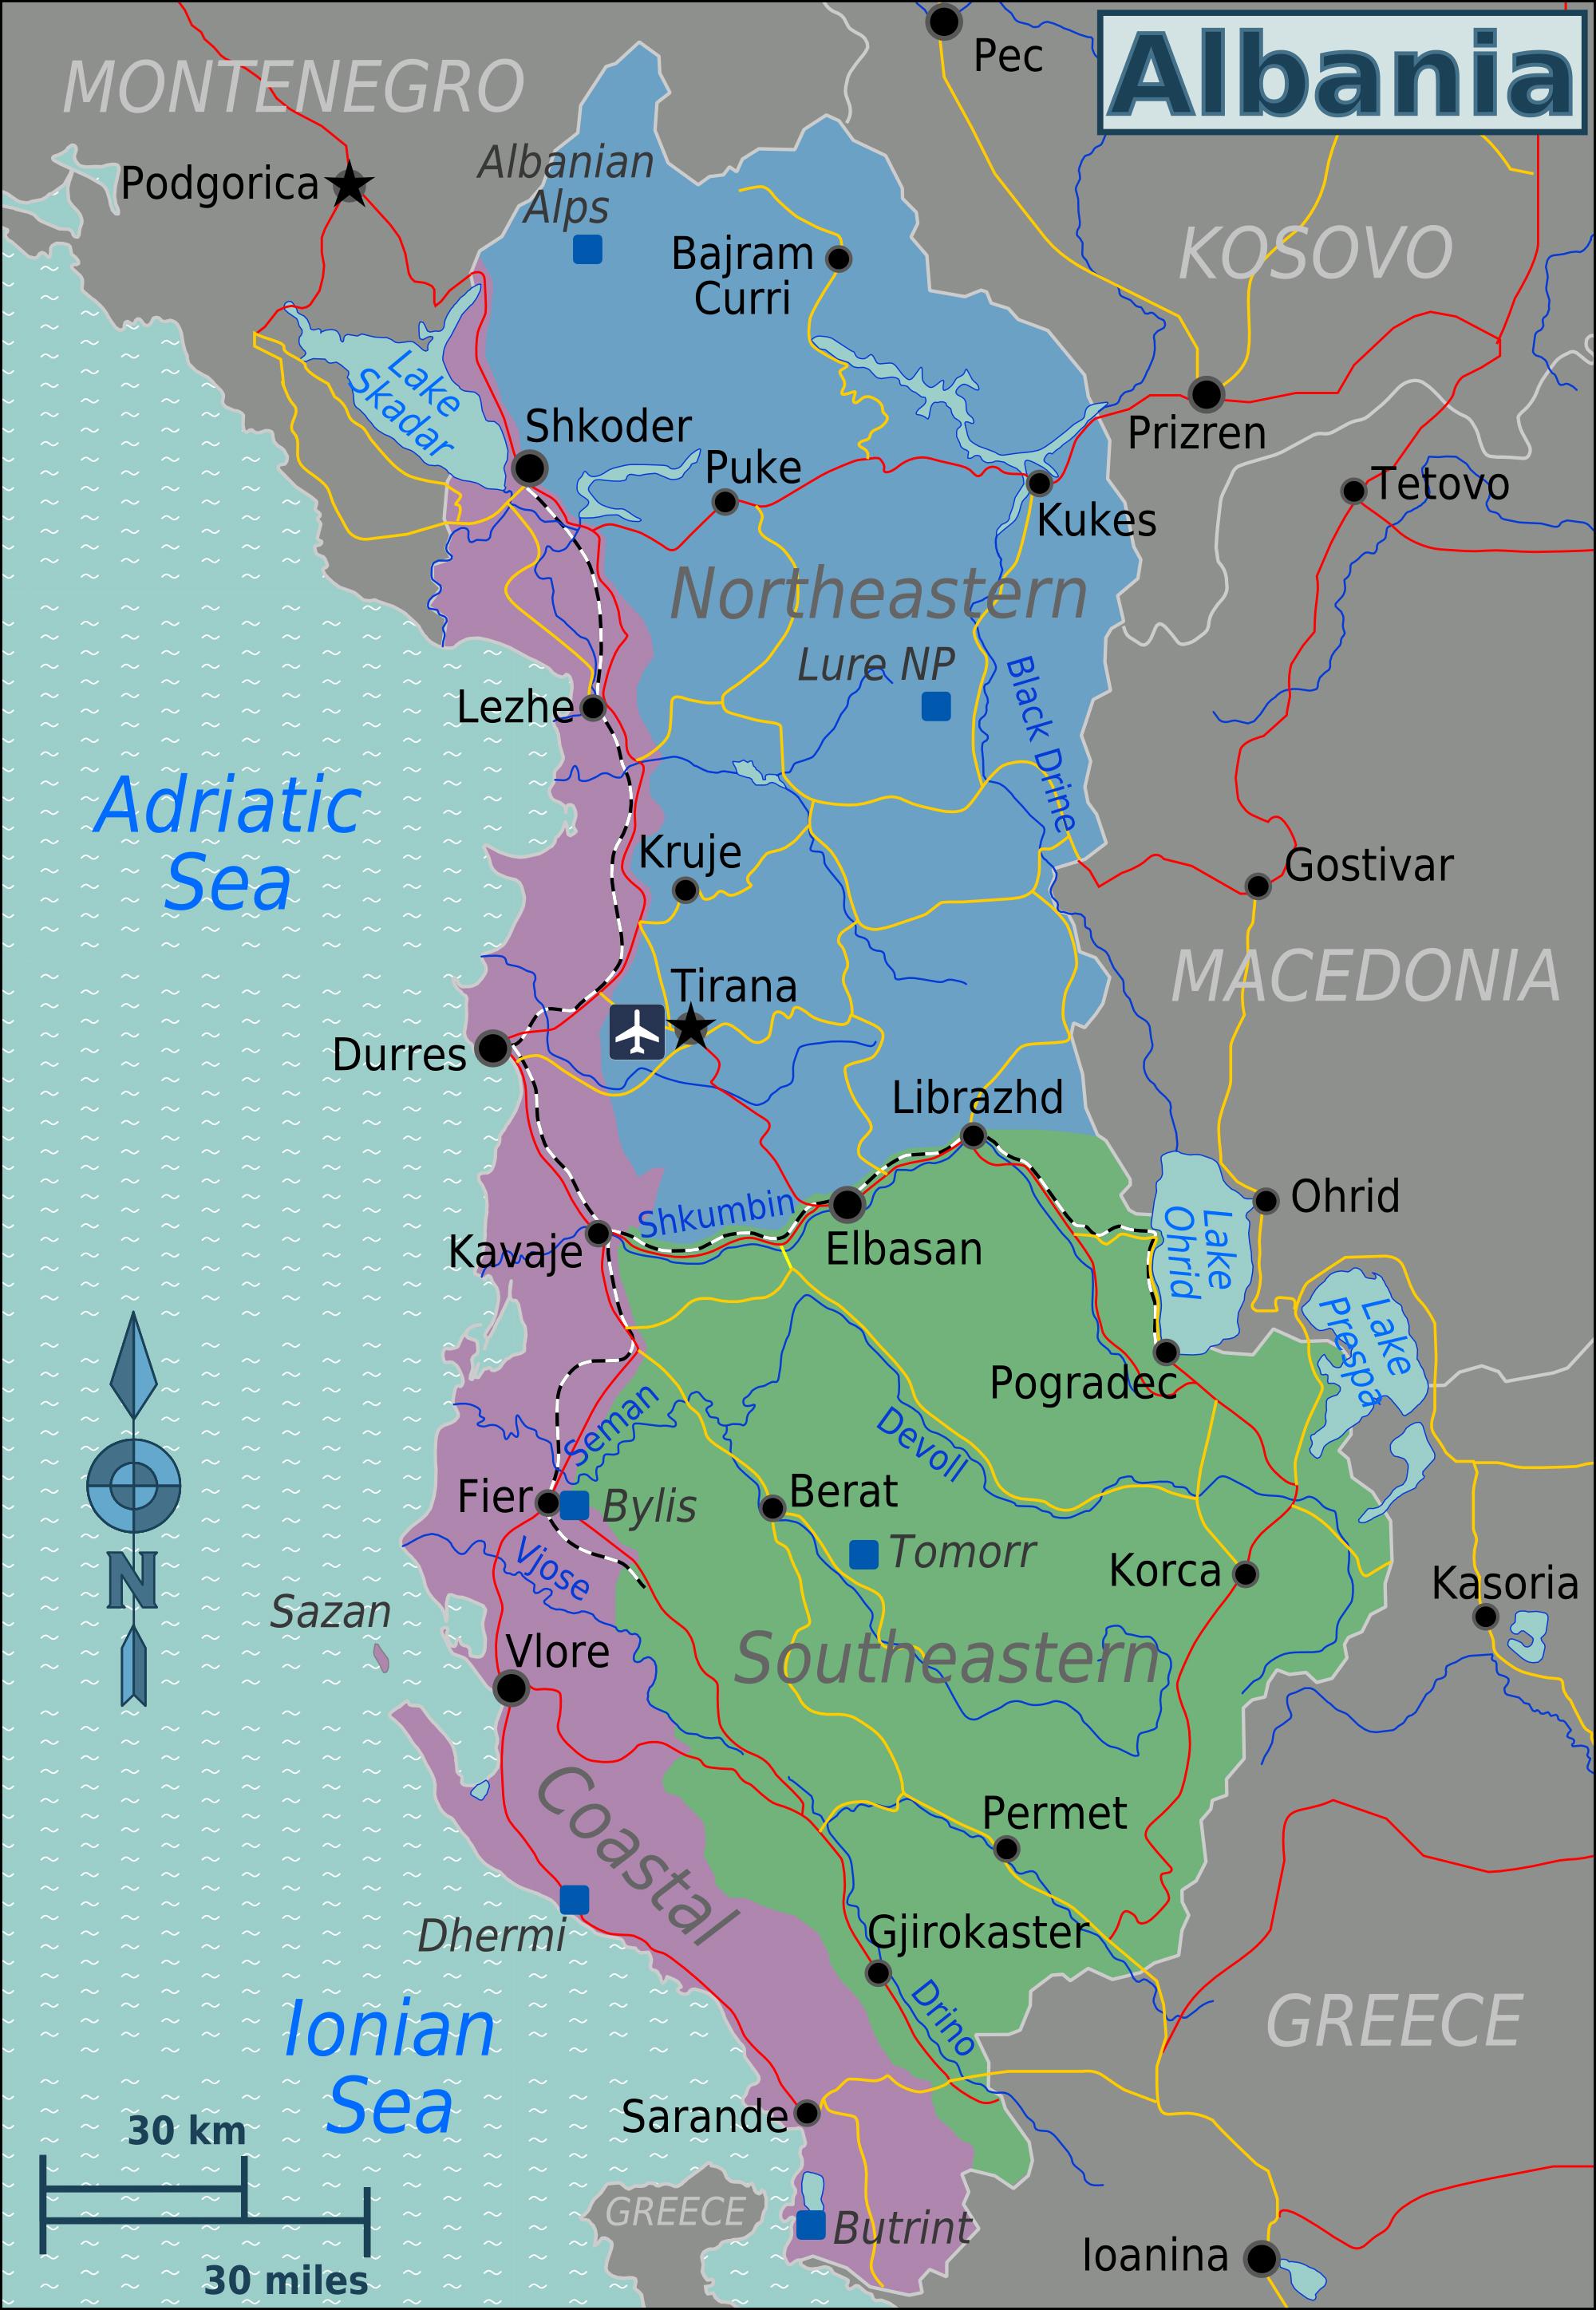 Large regions map of Albania Albania large regions map Maps